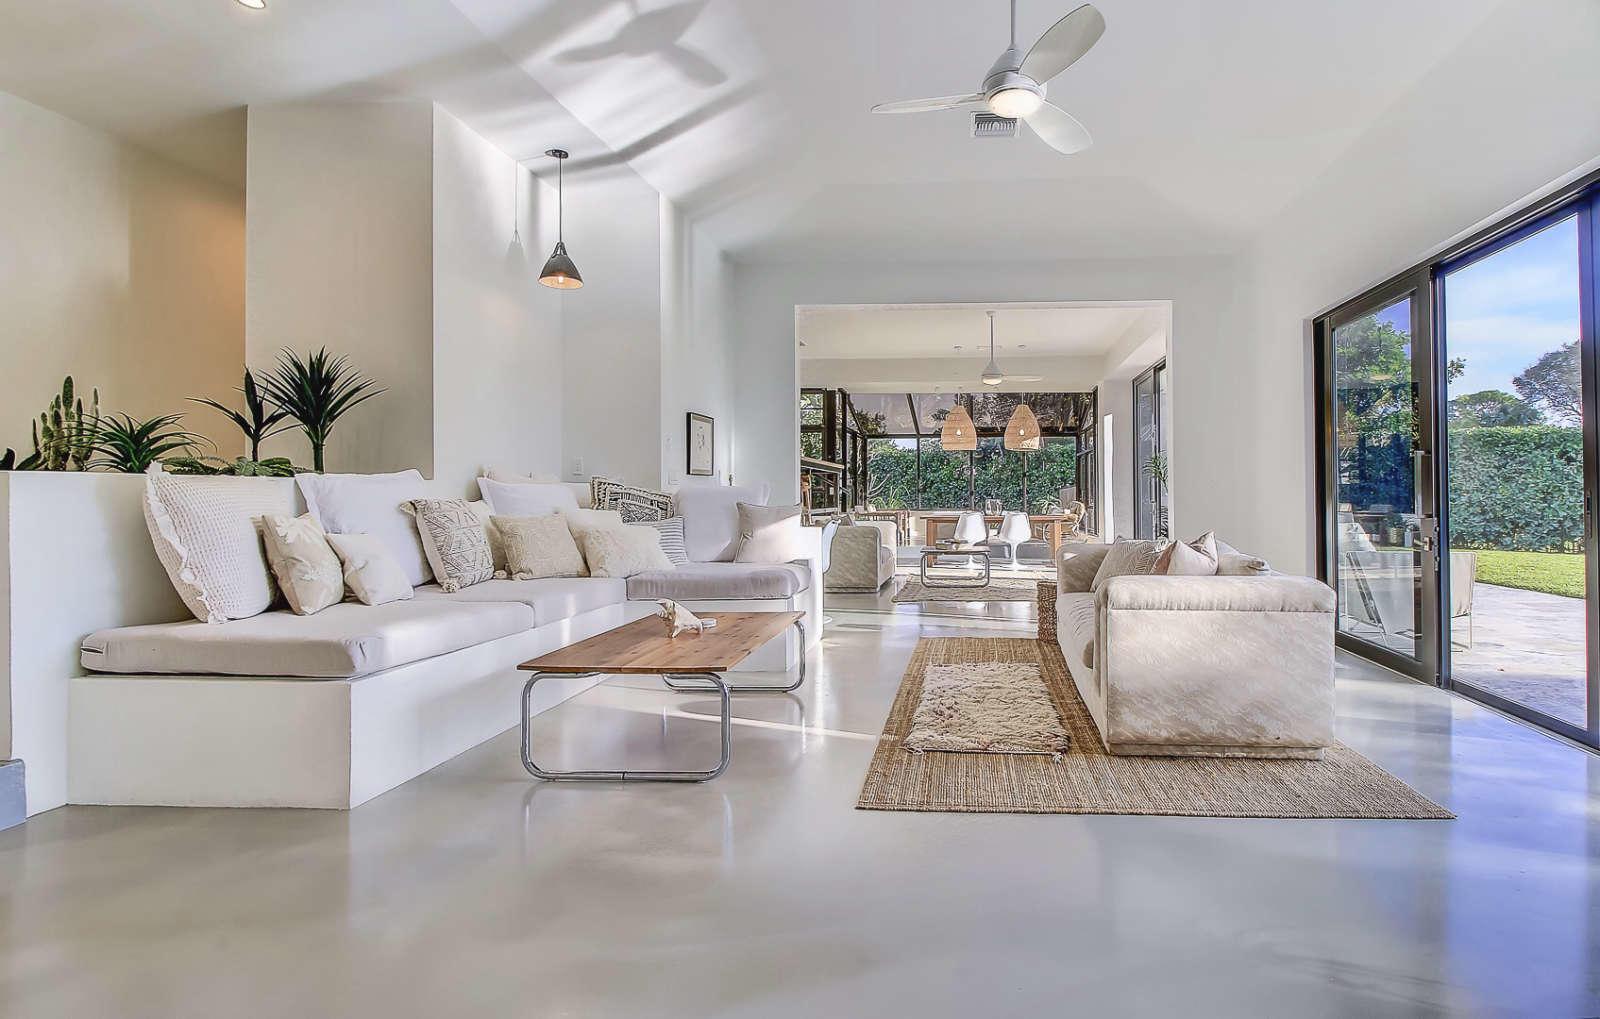 6080 Mariner Sands Drive, Stuart, Florida 34997, 3 Bedrooms Bedrooms, ,3 BathroomsBathrooms,A,Single family,Mariner Sands,RX-10585826